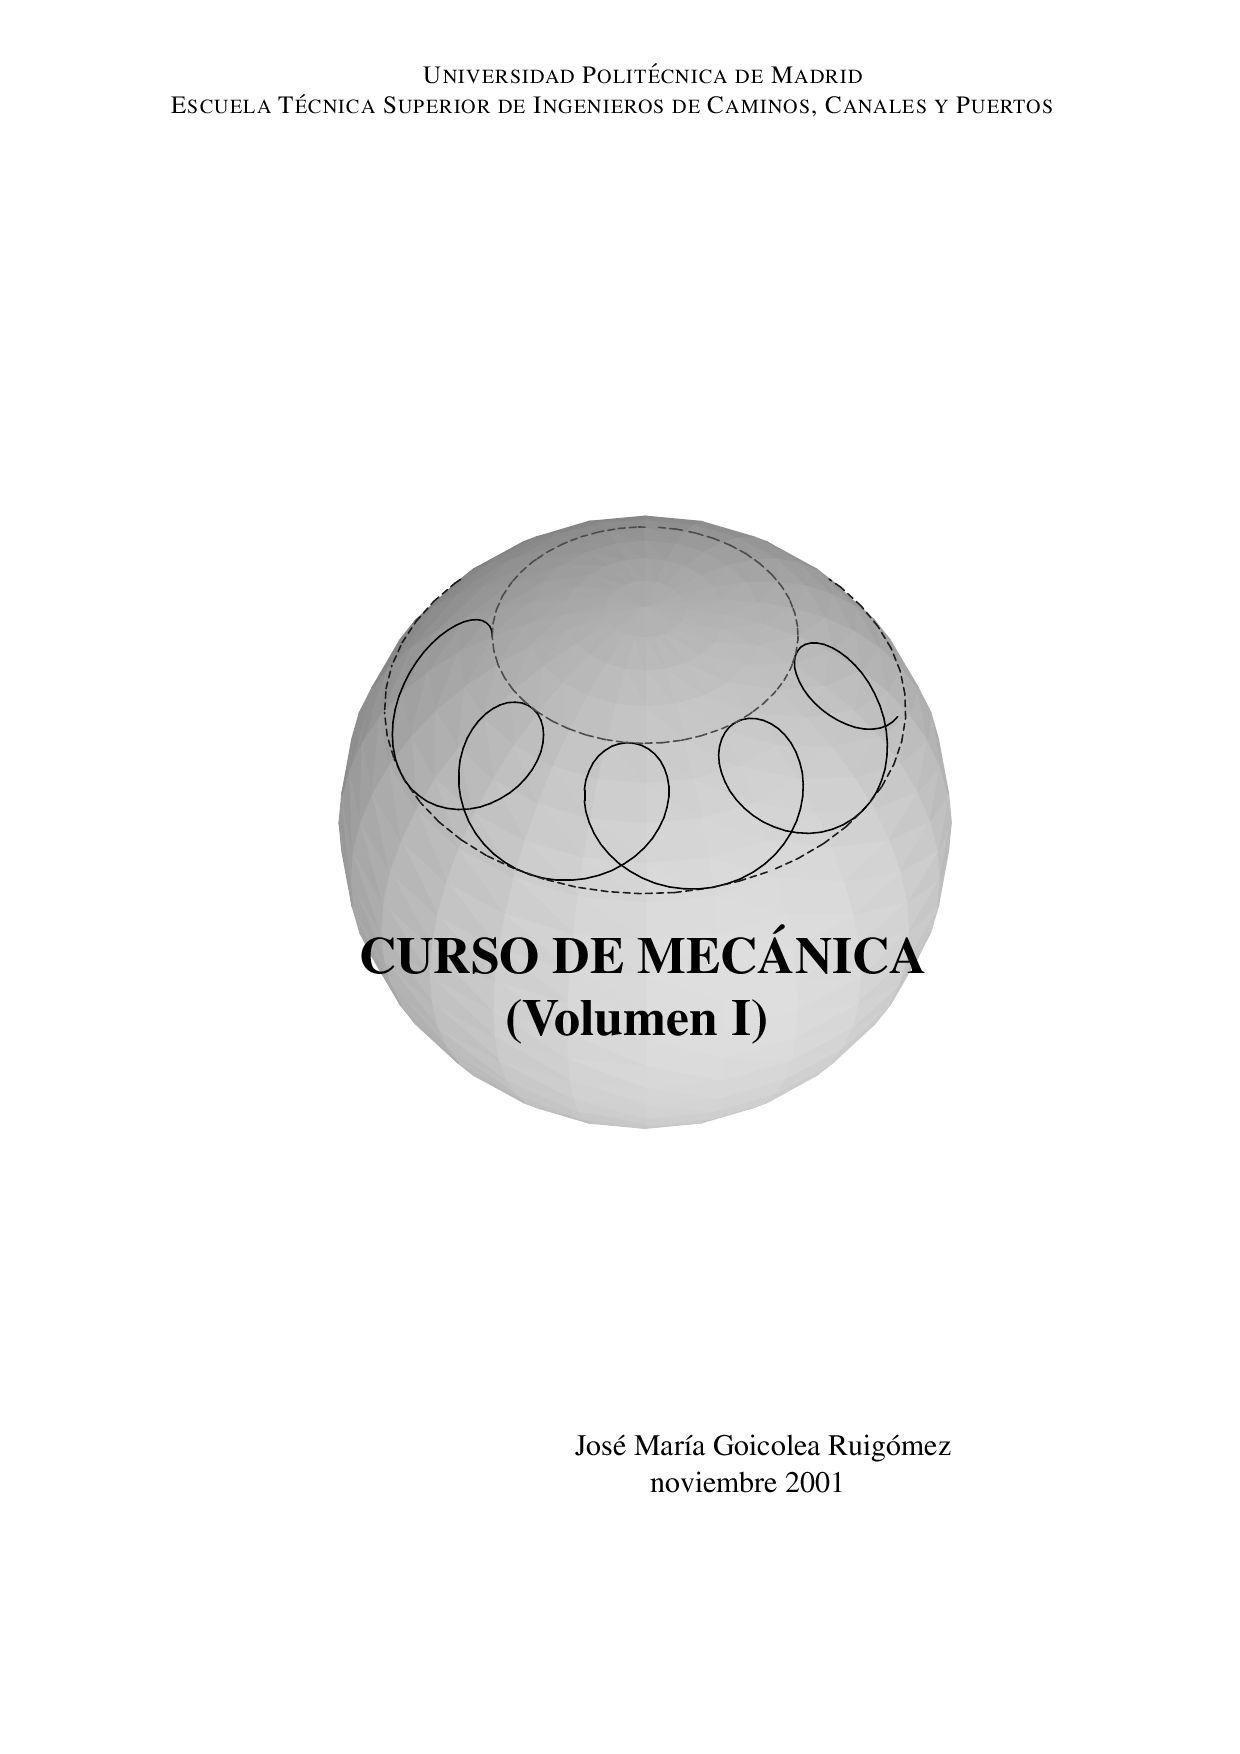 FISICA - Mecanica Clasica by Contexto Inc. - issuu